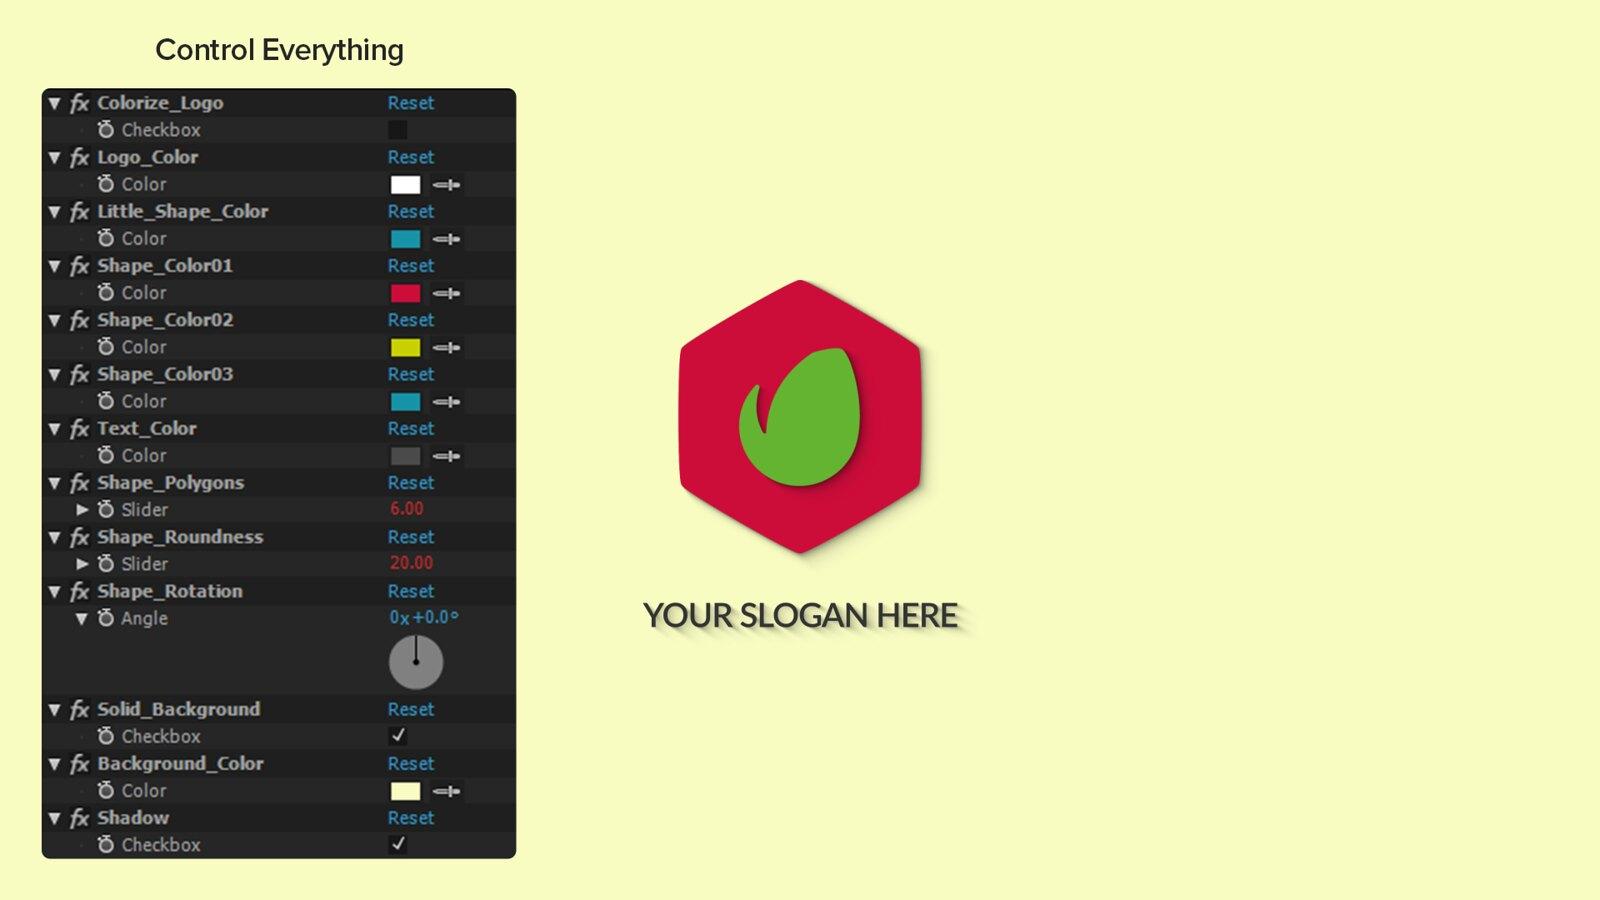 Amazing rd simple colorful logo reveal corporate envato videohive rd simple colorful logo reveal corporate envato videohive after effects templates maxwellsz